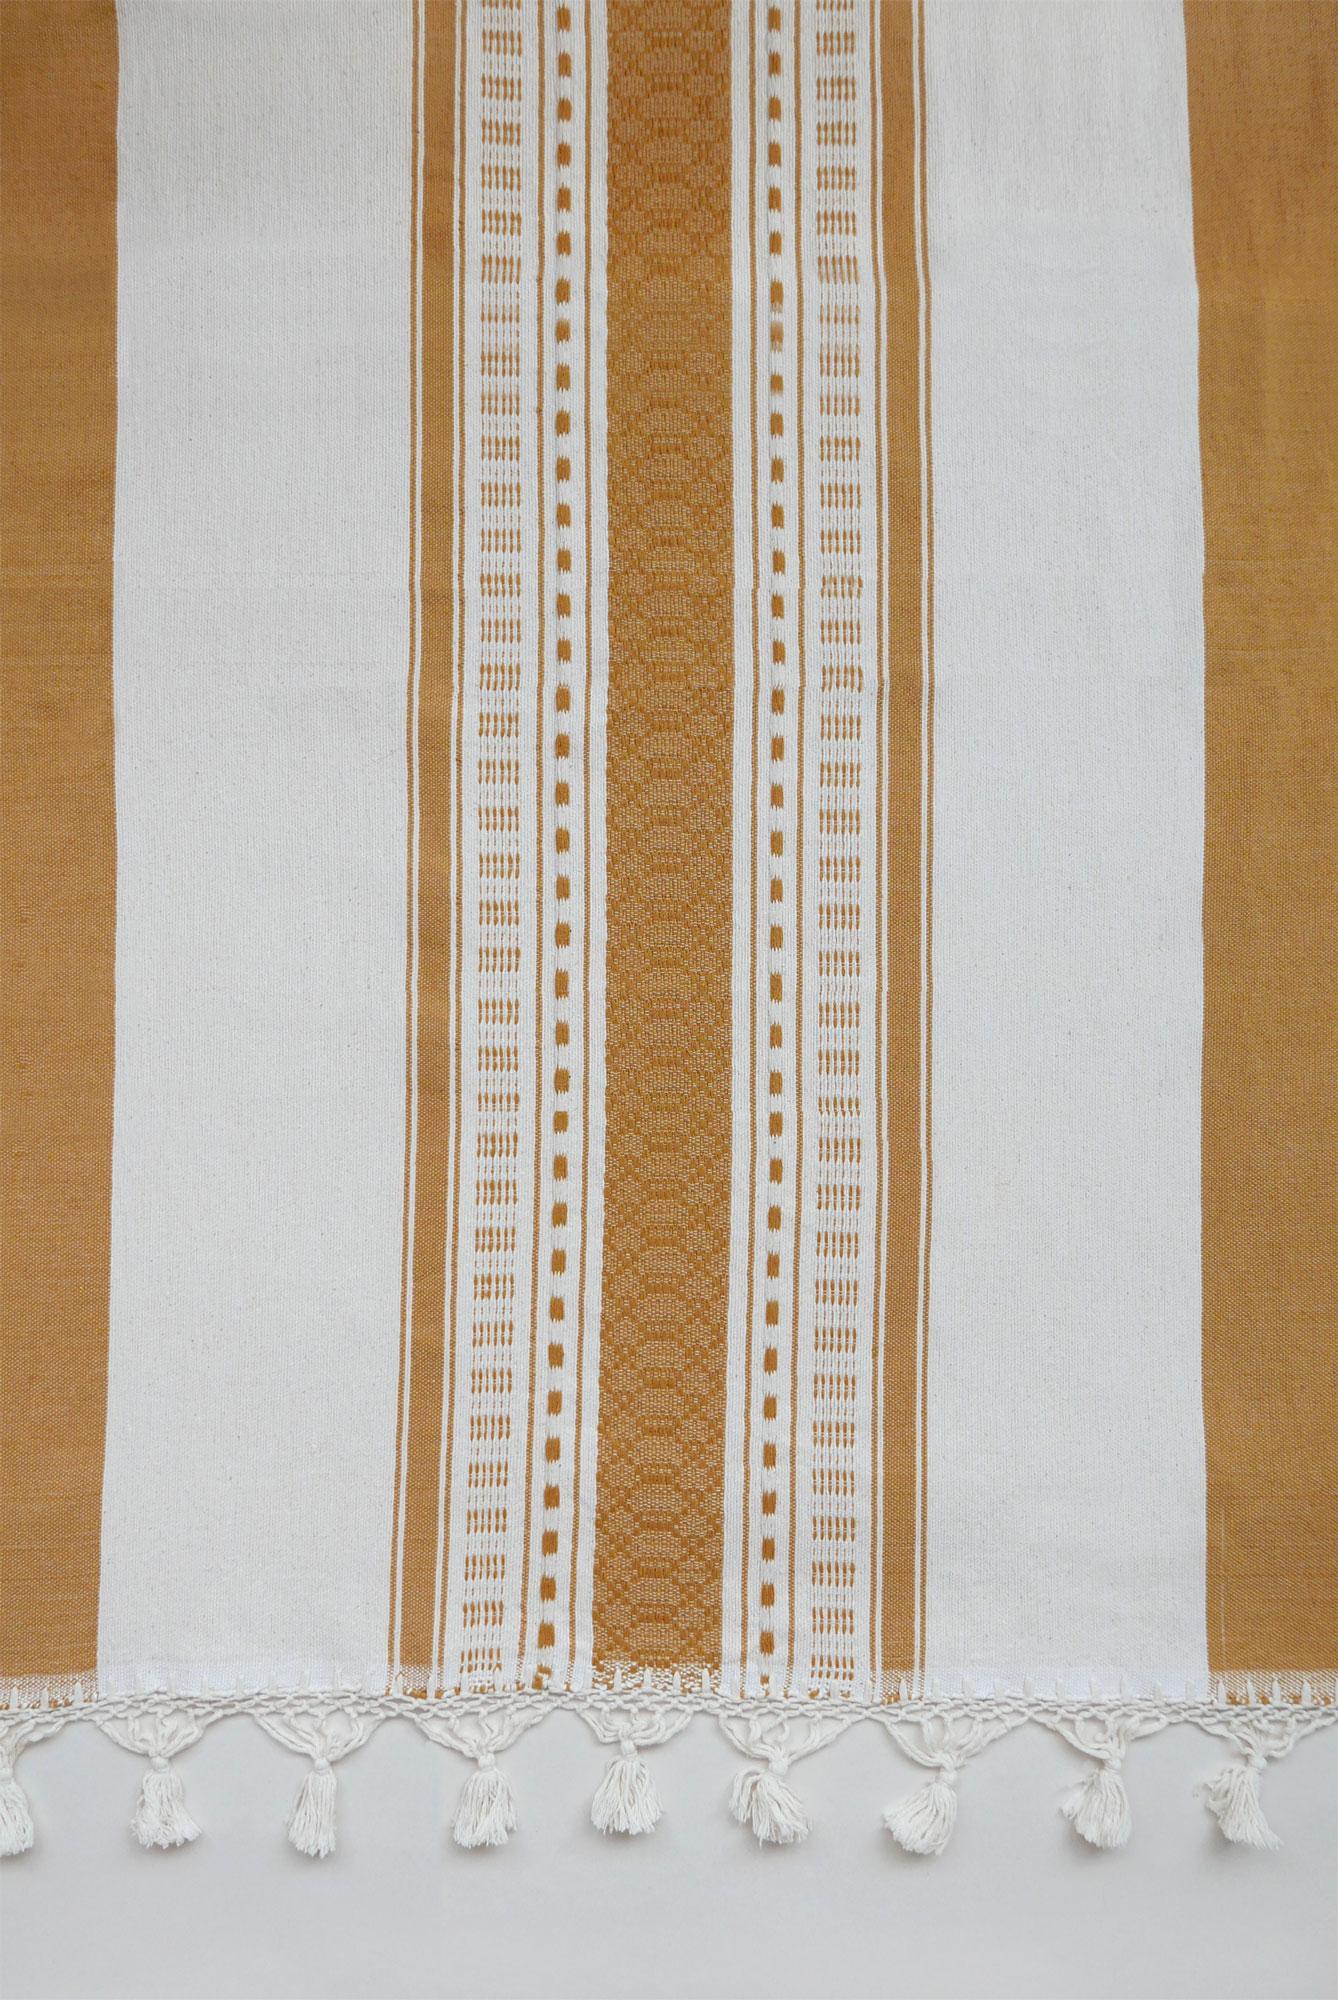 Mexican Mustard Bedspread - www.nidocollective.com #bedspread #handmade #mexicanbedspread